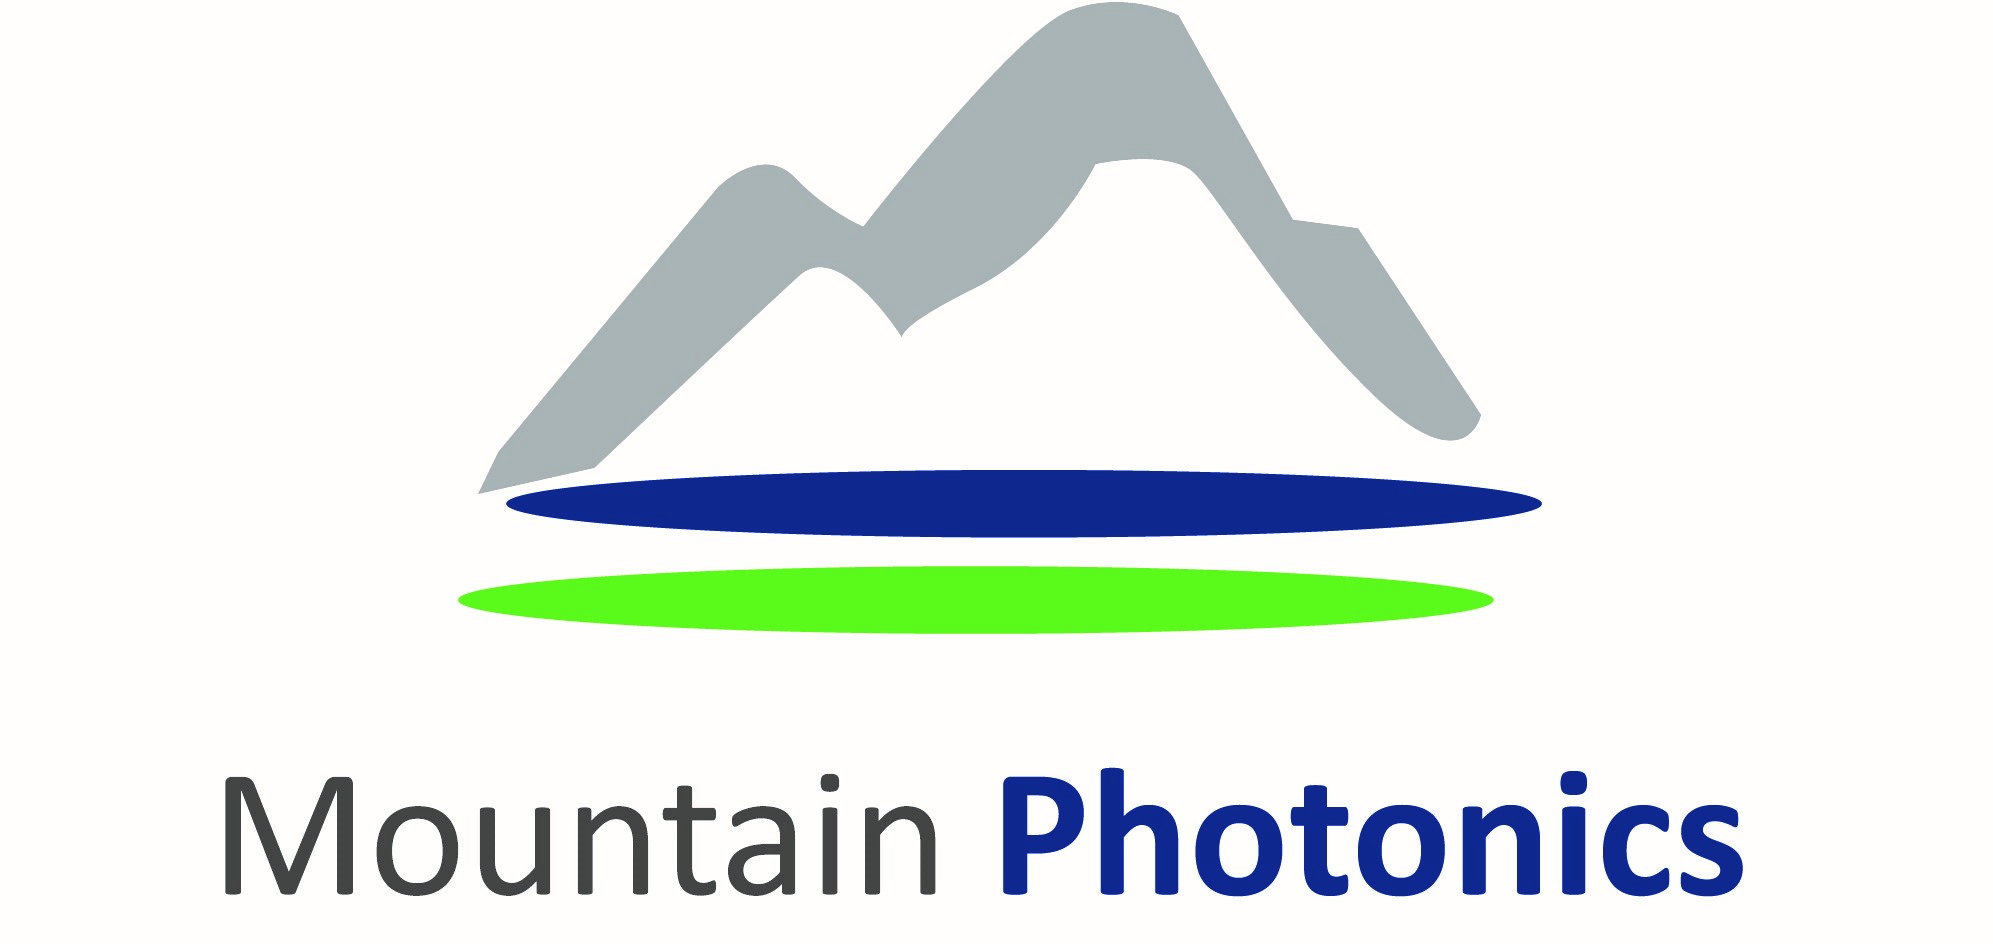 Mountain Photonics GmbH